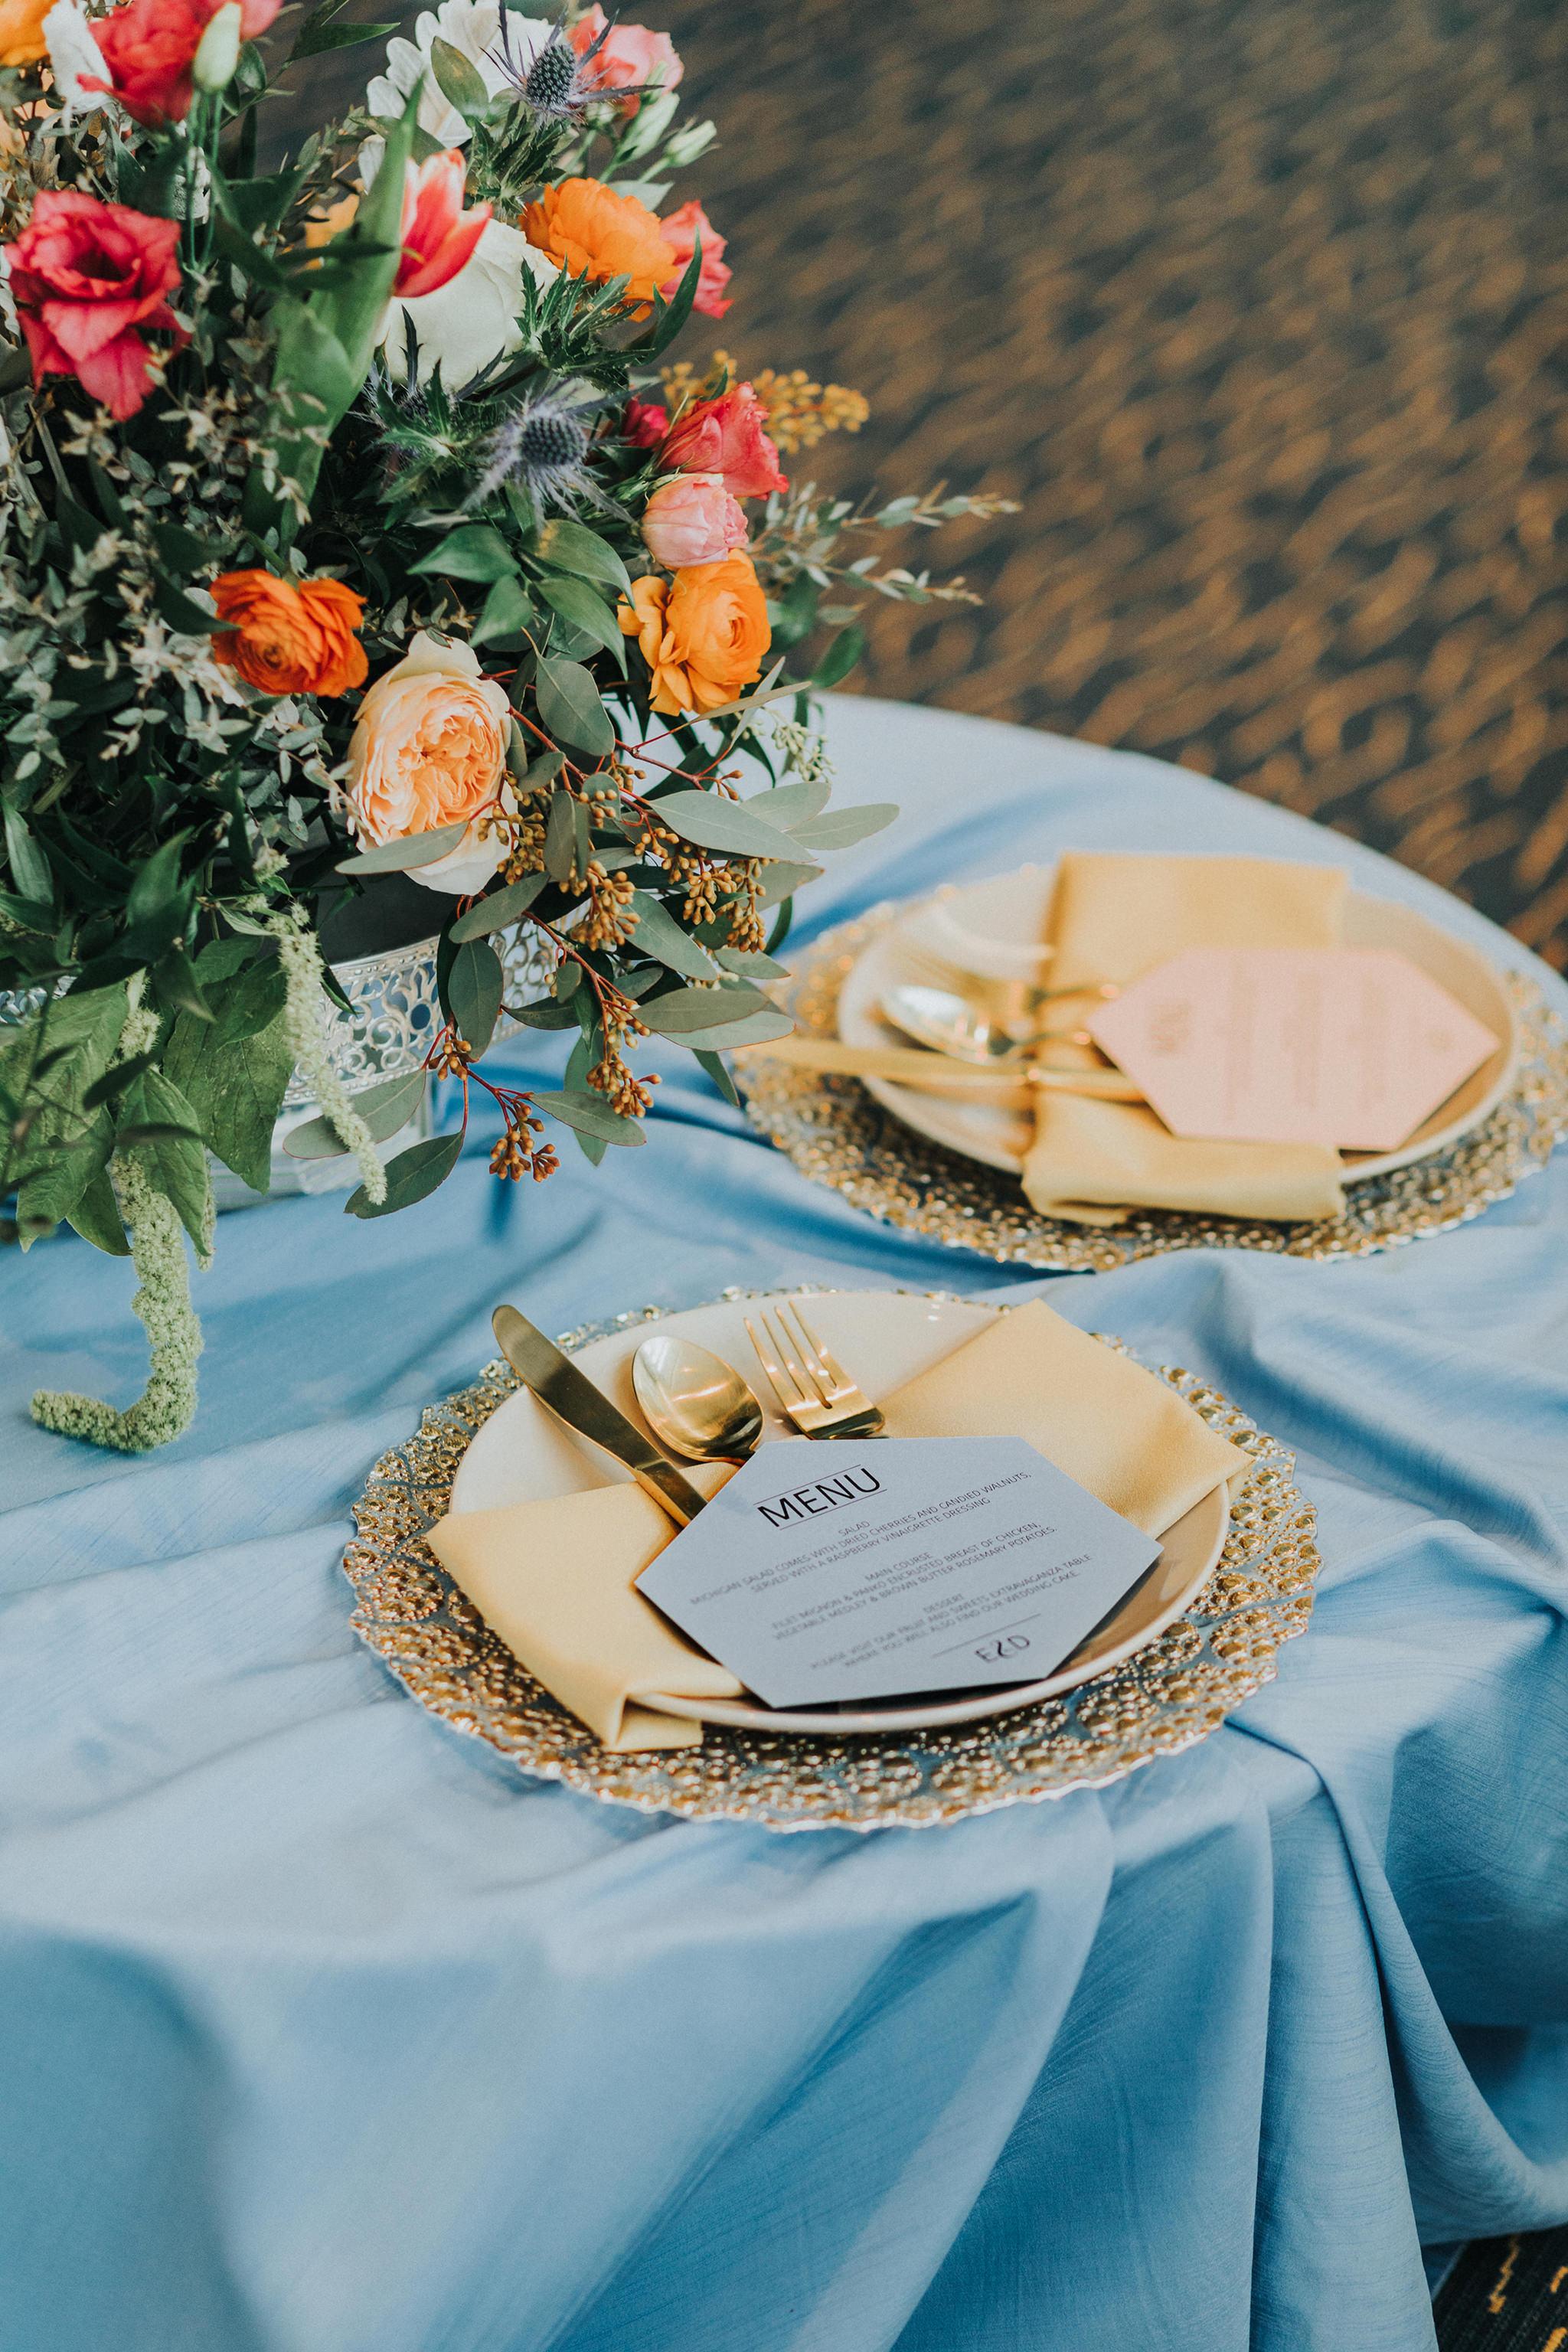 6omaha-wedding-photographer-planner-tiny-luxe-velvet-sage.jpg